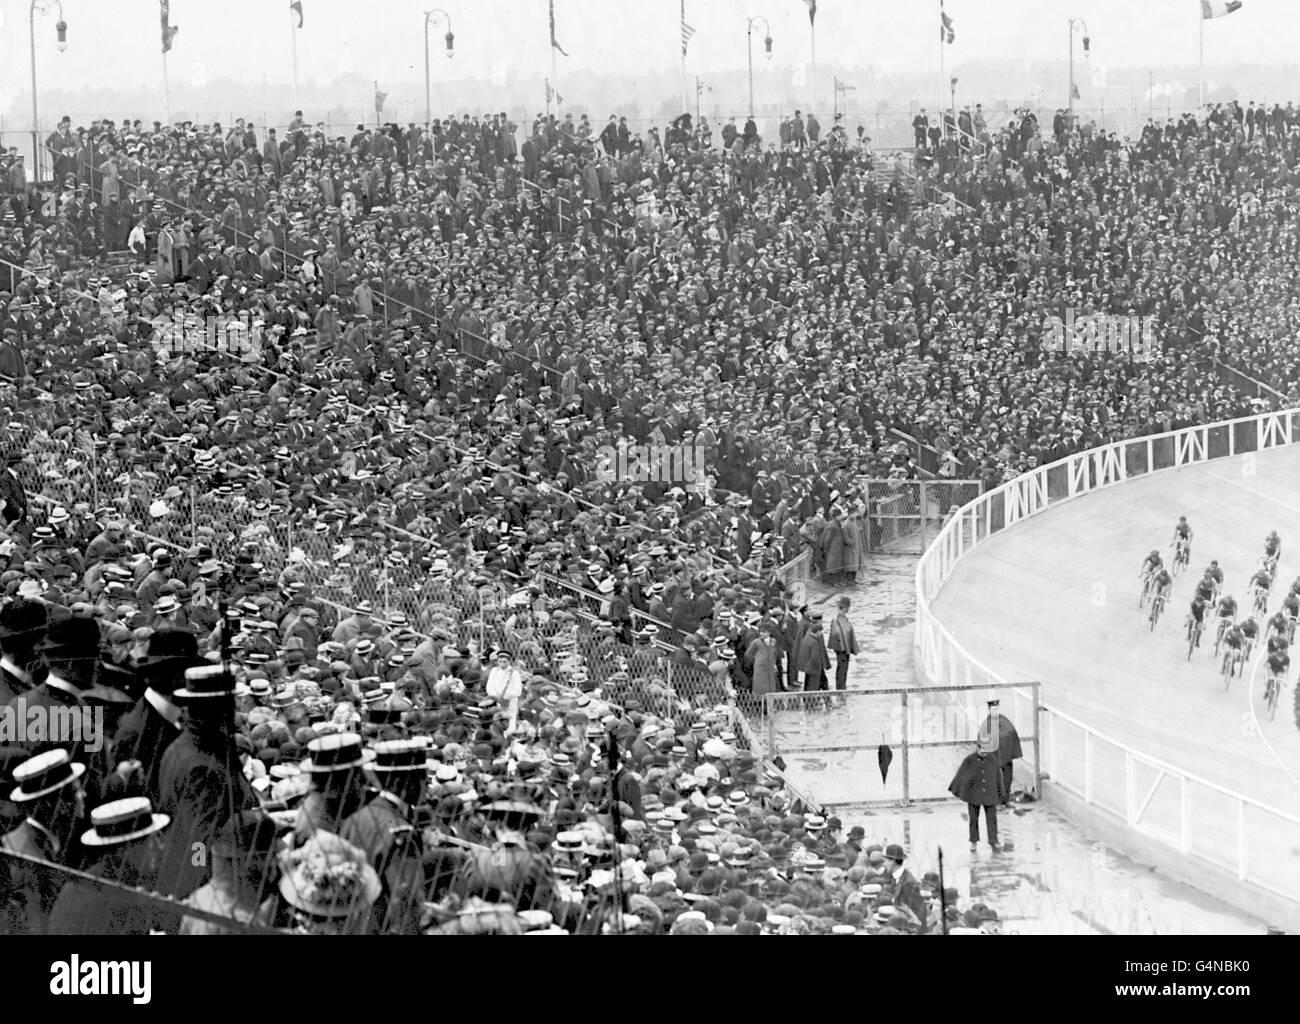 LONDON OLYMPICS : 1908 - Stock Image